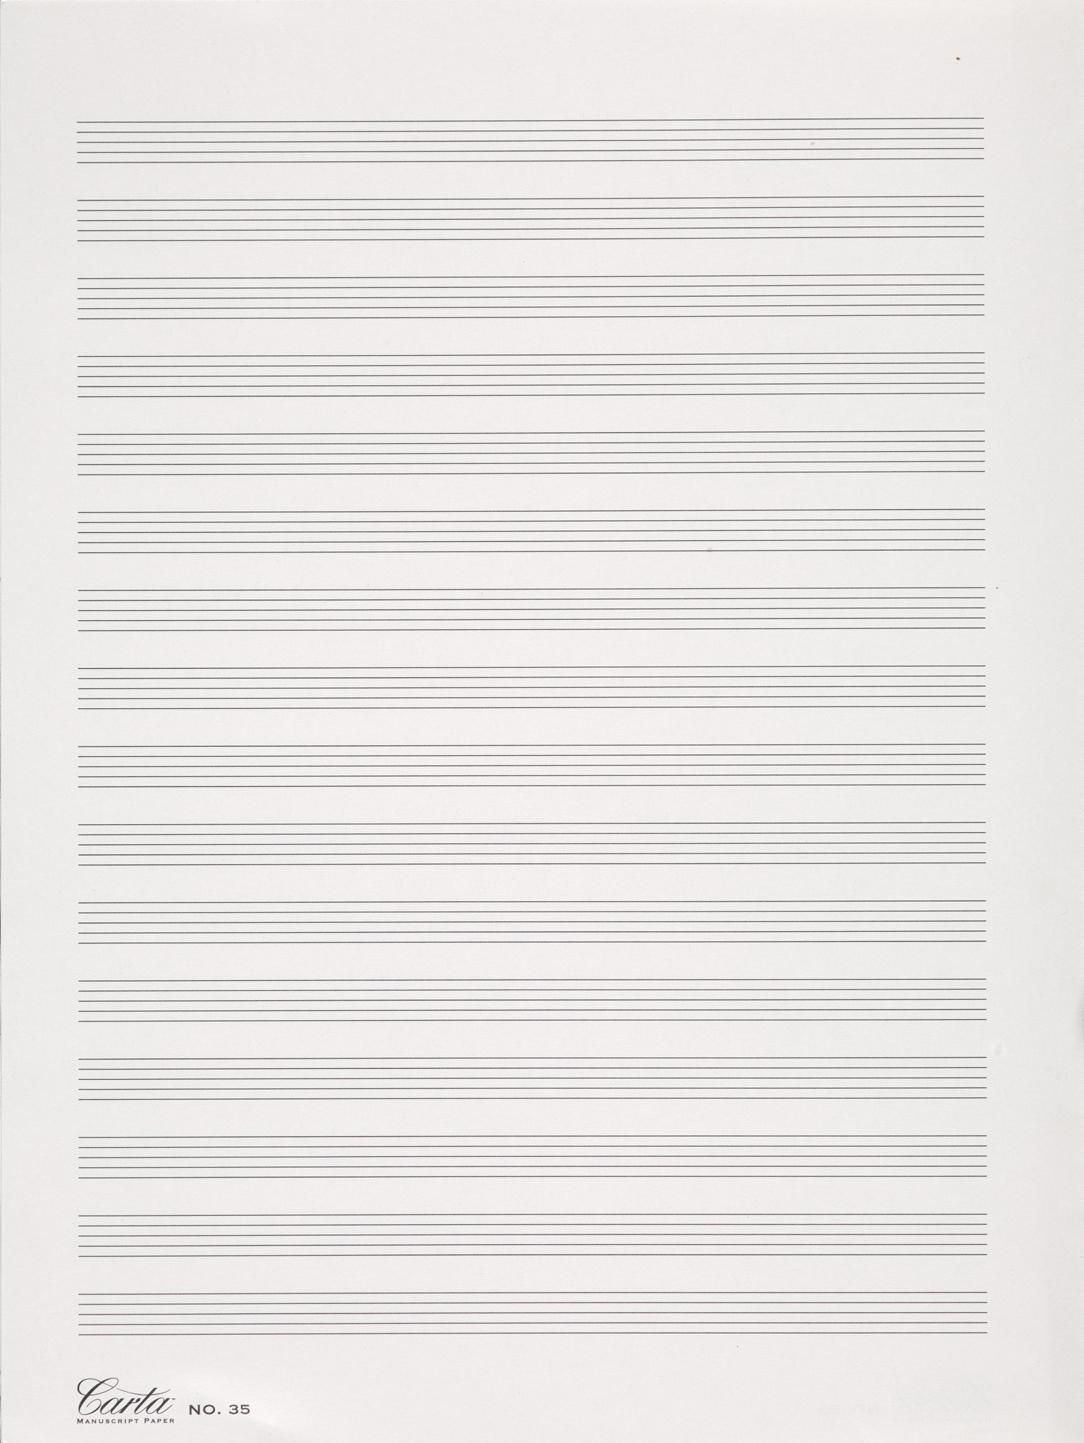 photograph of manuscript